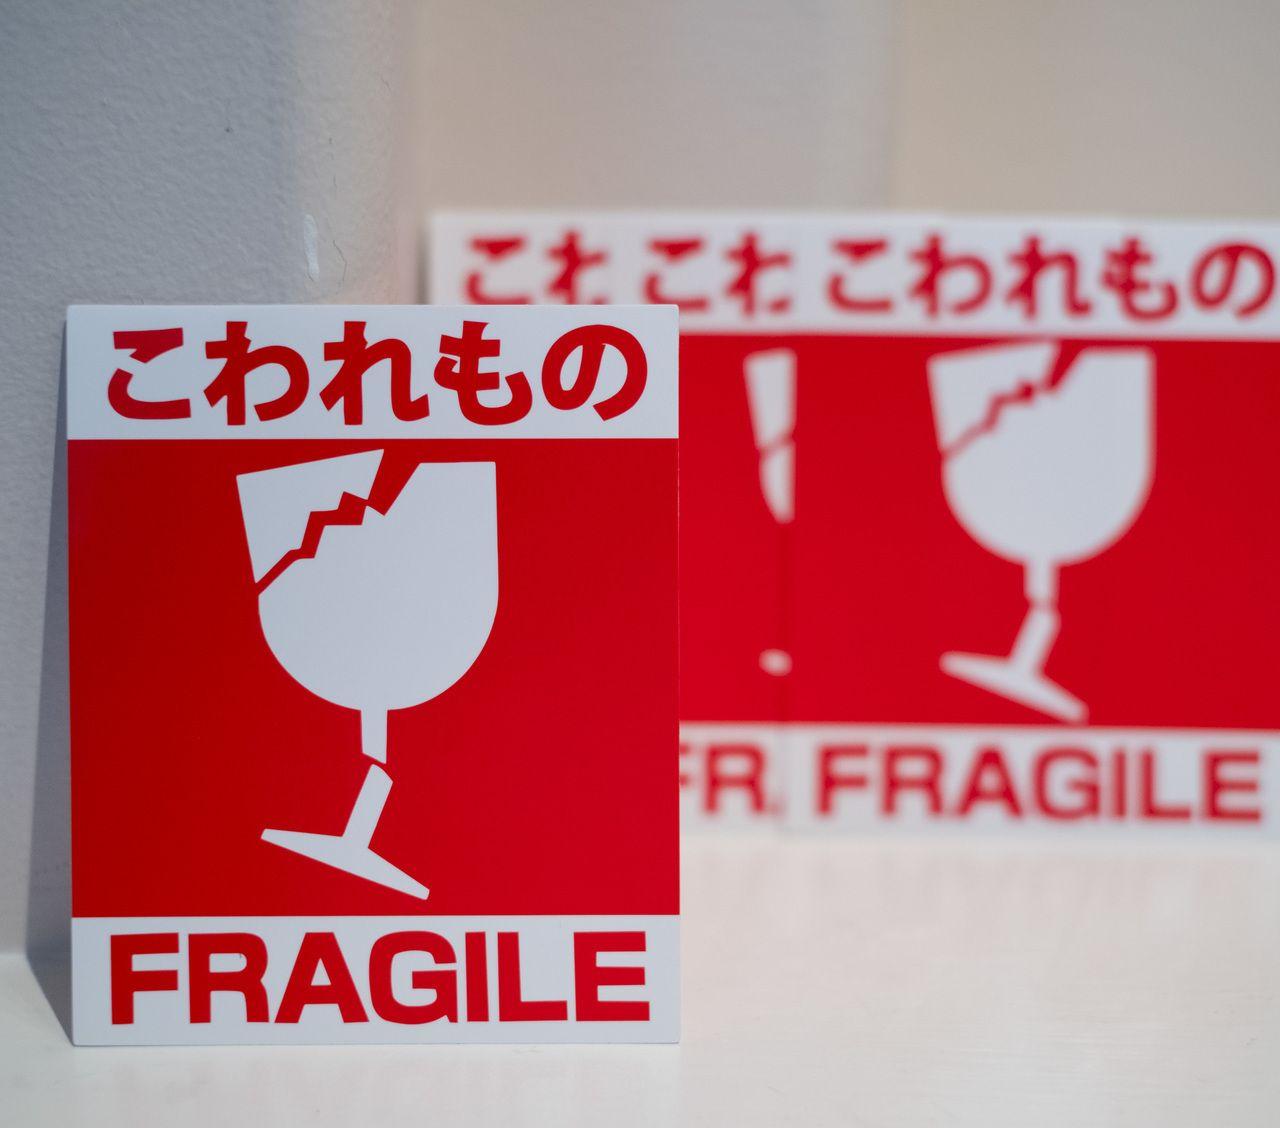 4265 Japan Travel FRAGILE Reusable Baggage Luggage Label